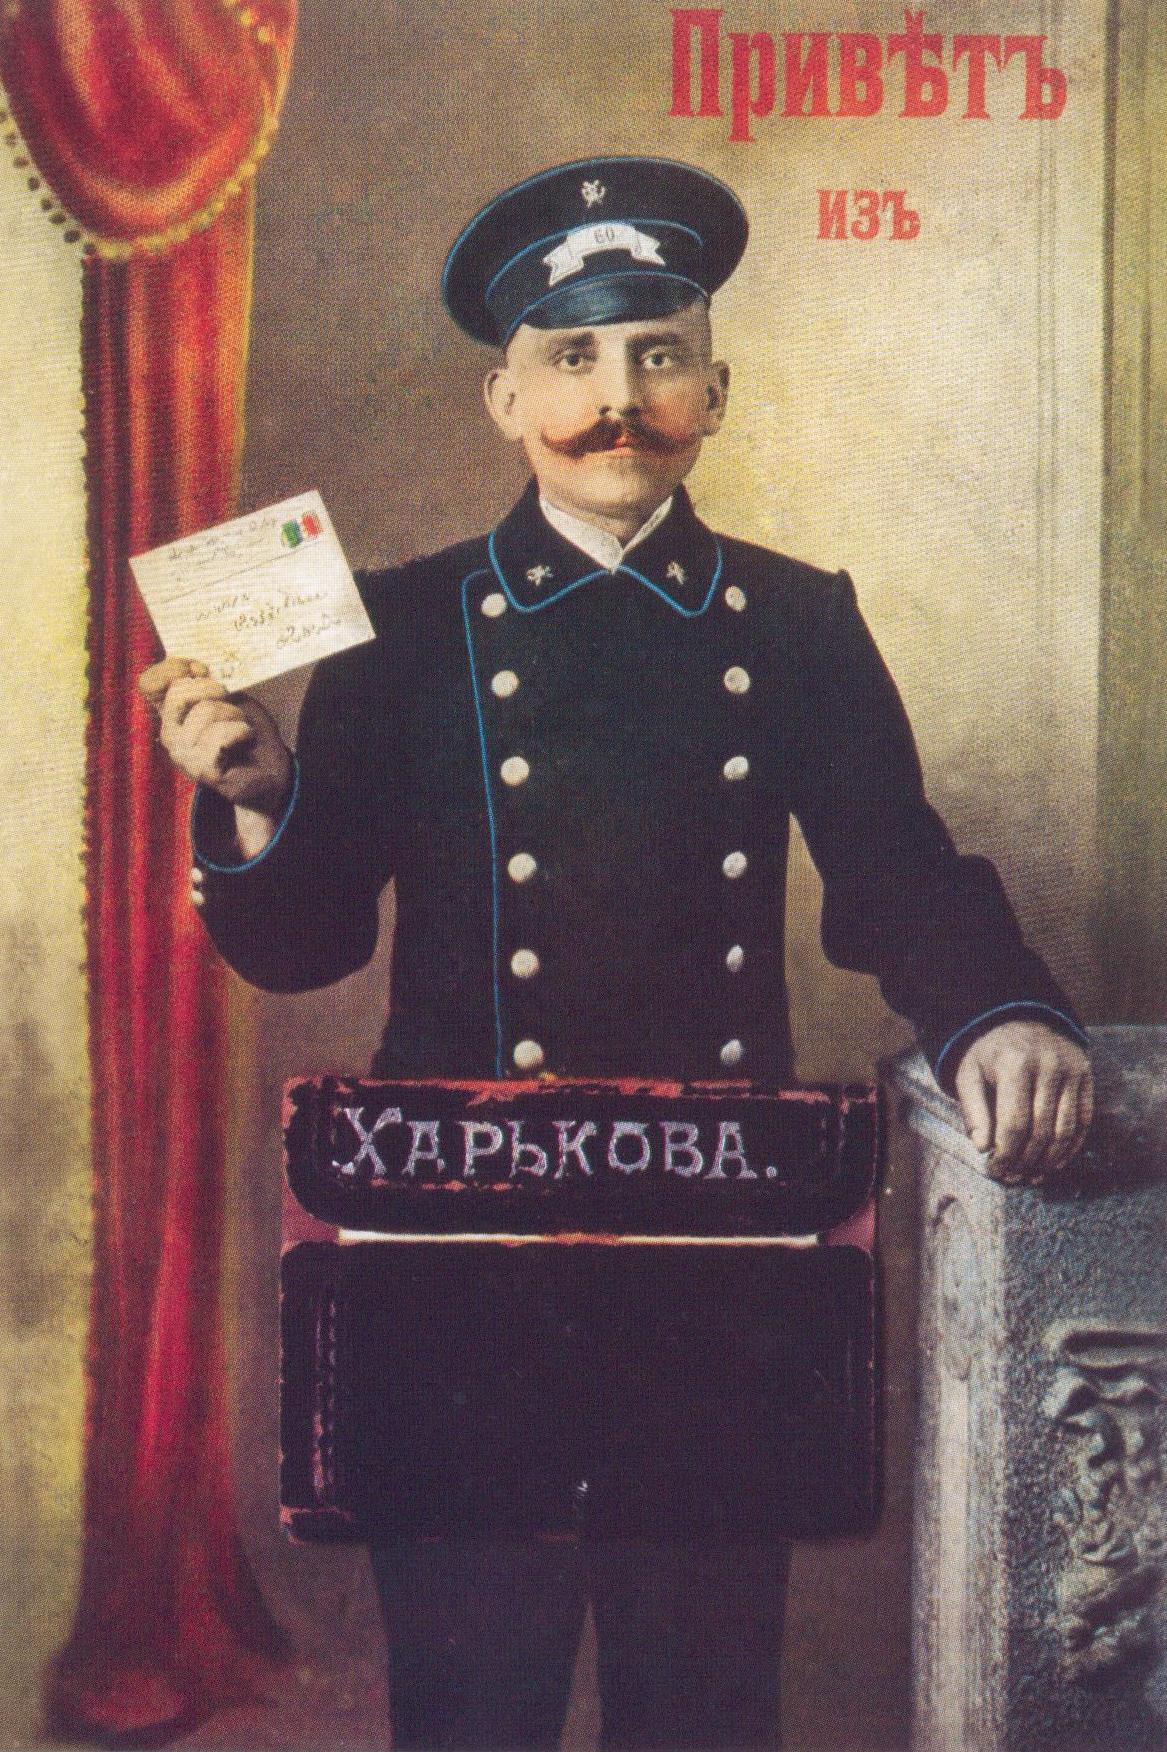 Postcard portraying a Russian Empire postman